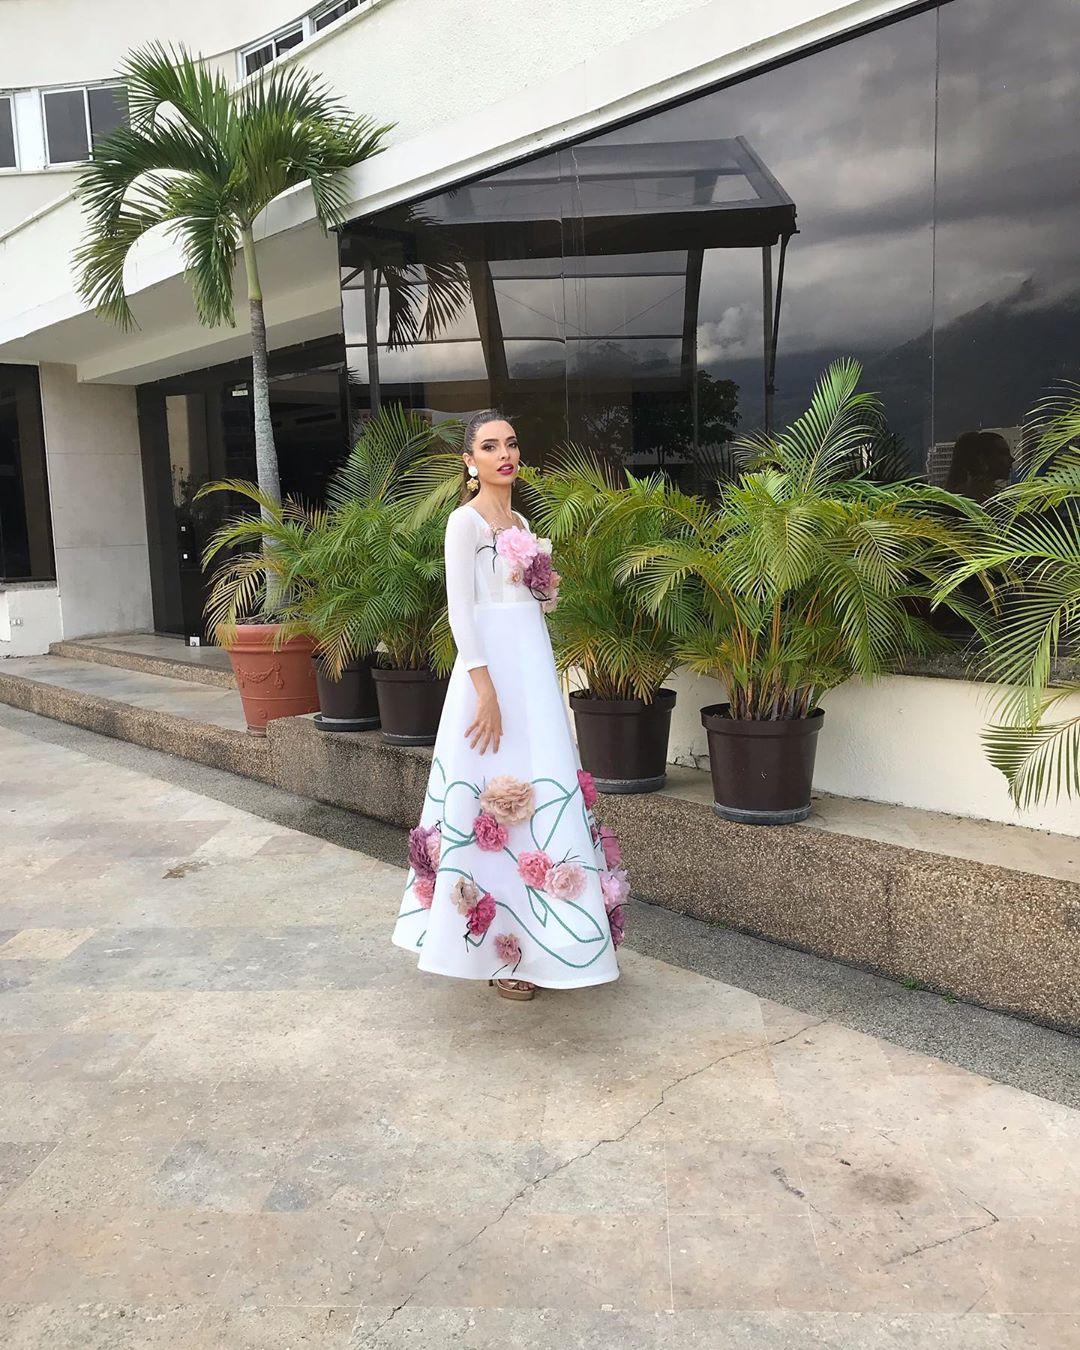 ainara de santamaria villamor, top 21 de miss grand international 2019/miss world cantabria 2018/miss earth spain 2017. - Página 17 73537411